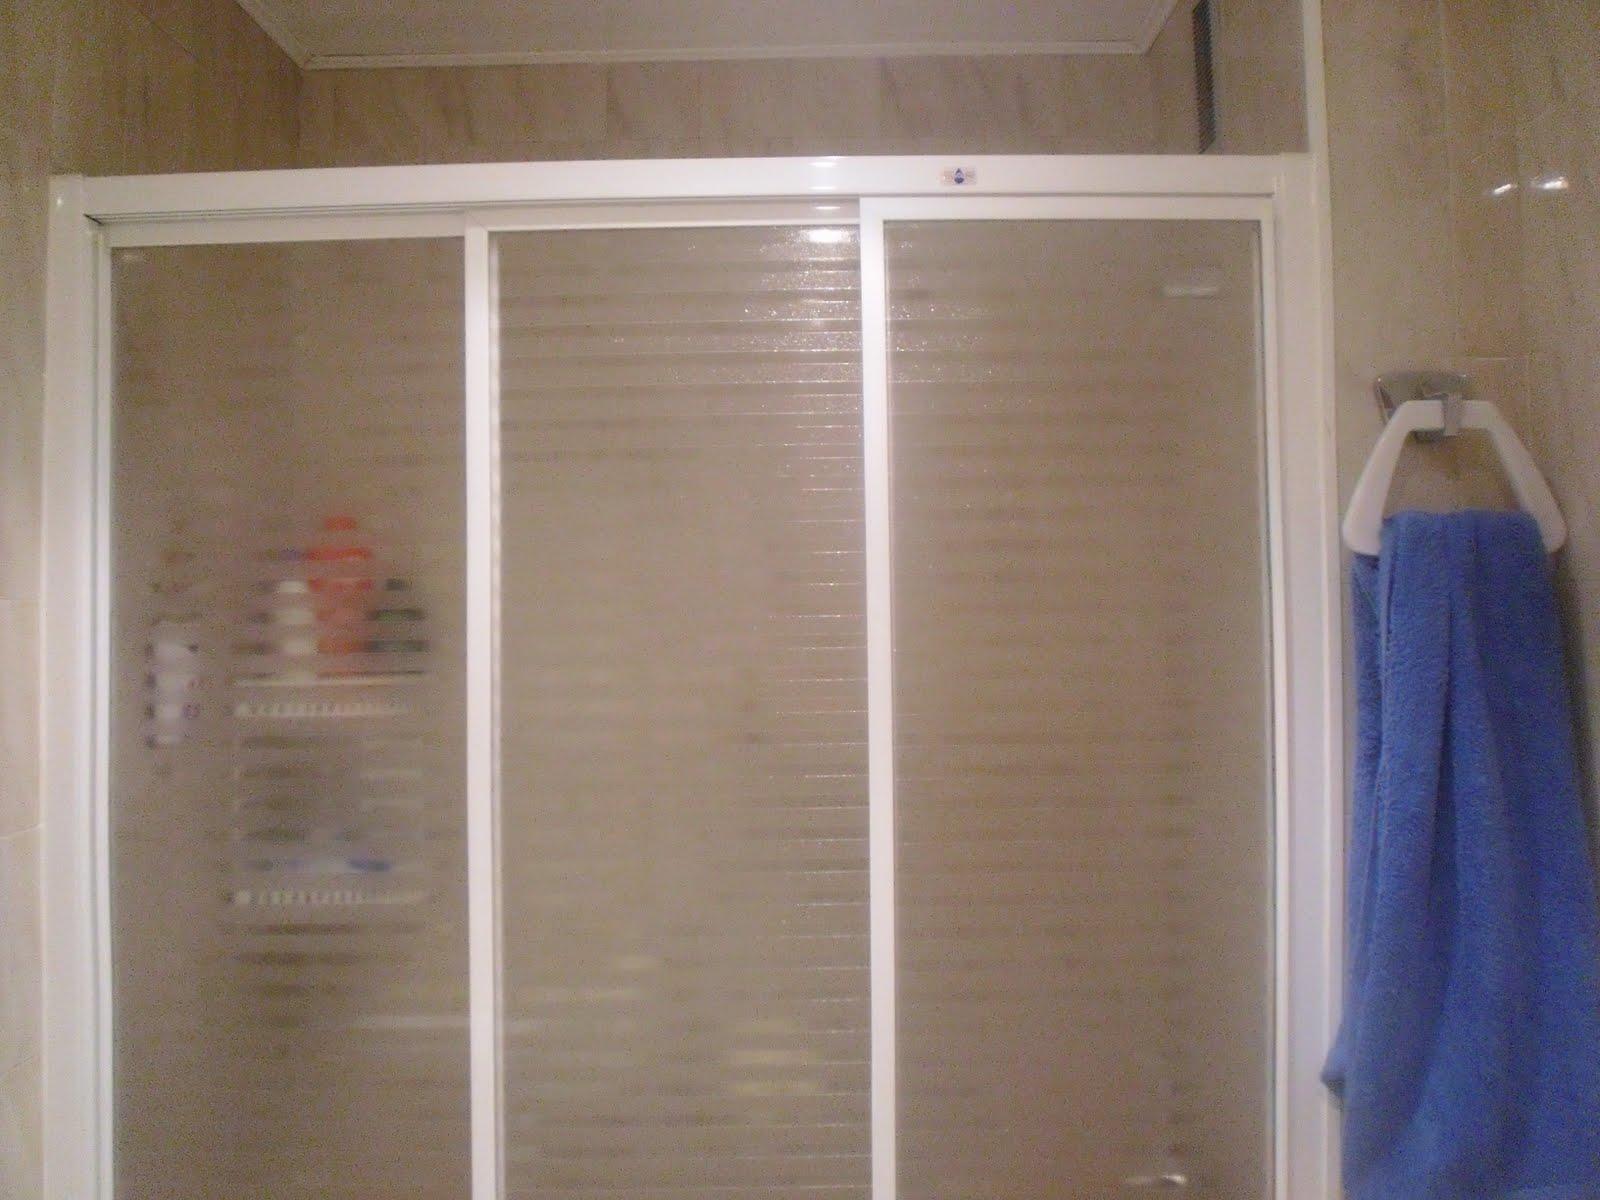 puertas correderas de aluminio para baopuertas de aluminio para banos puertas correderas de aluminio para bao